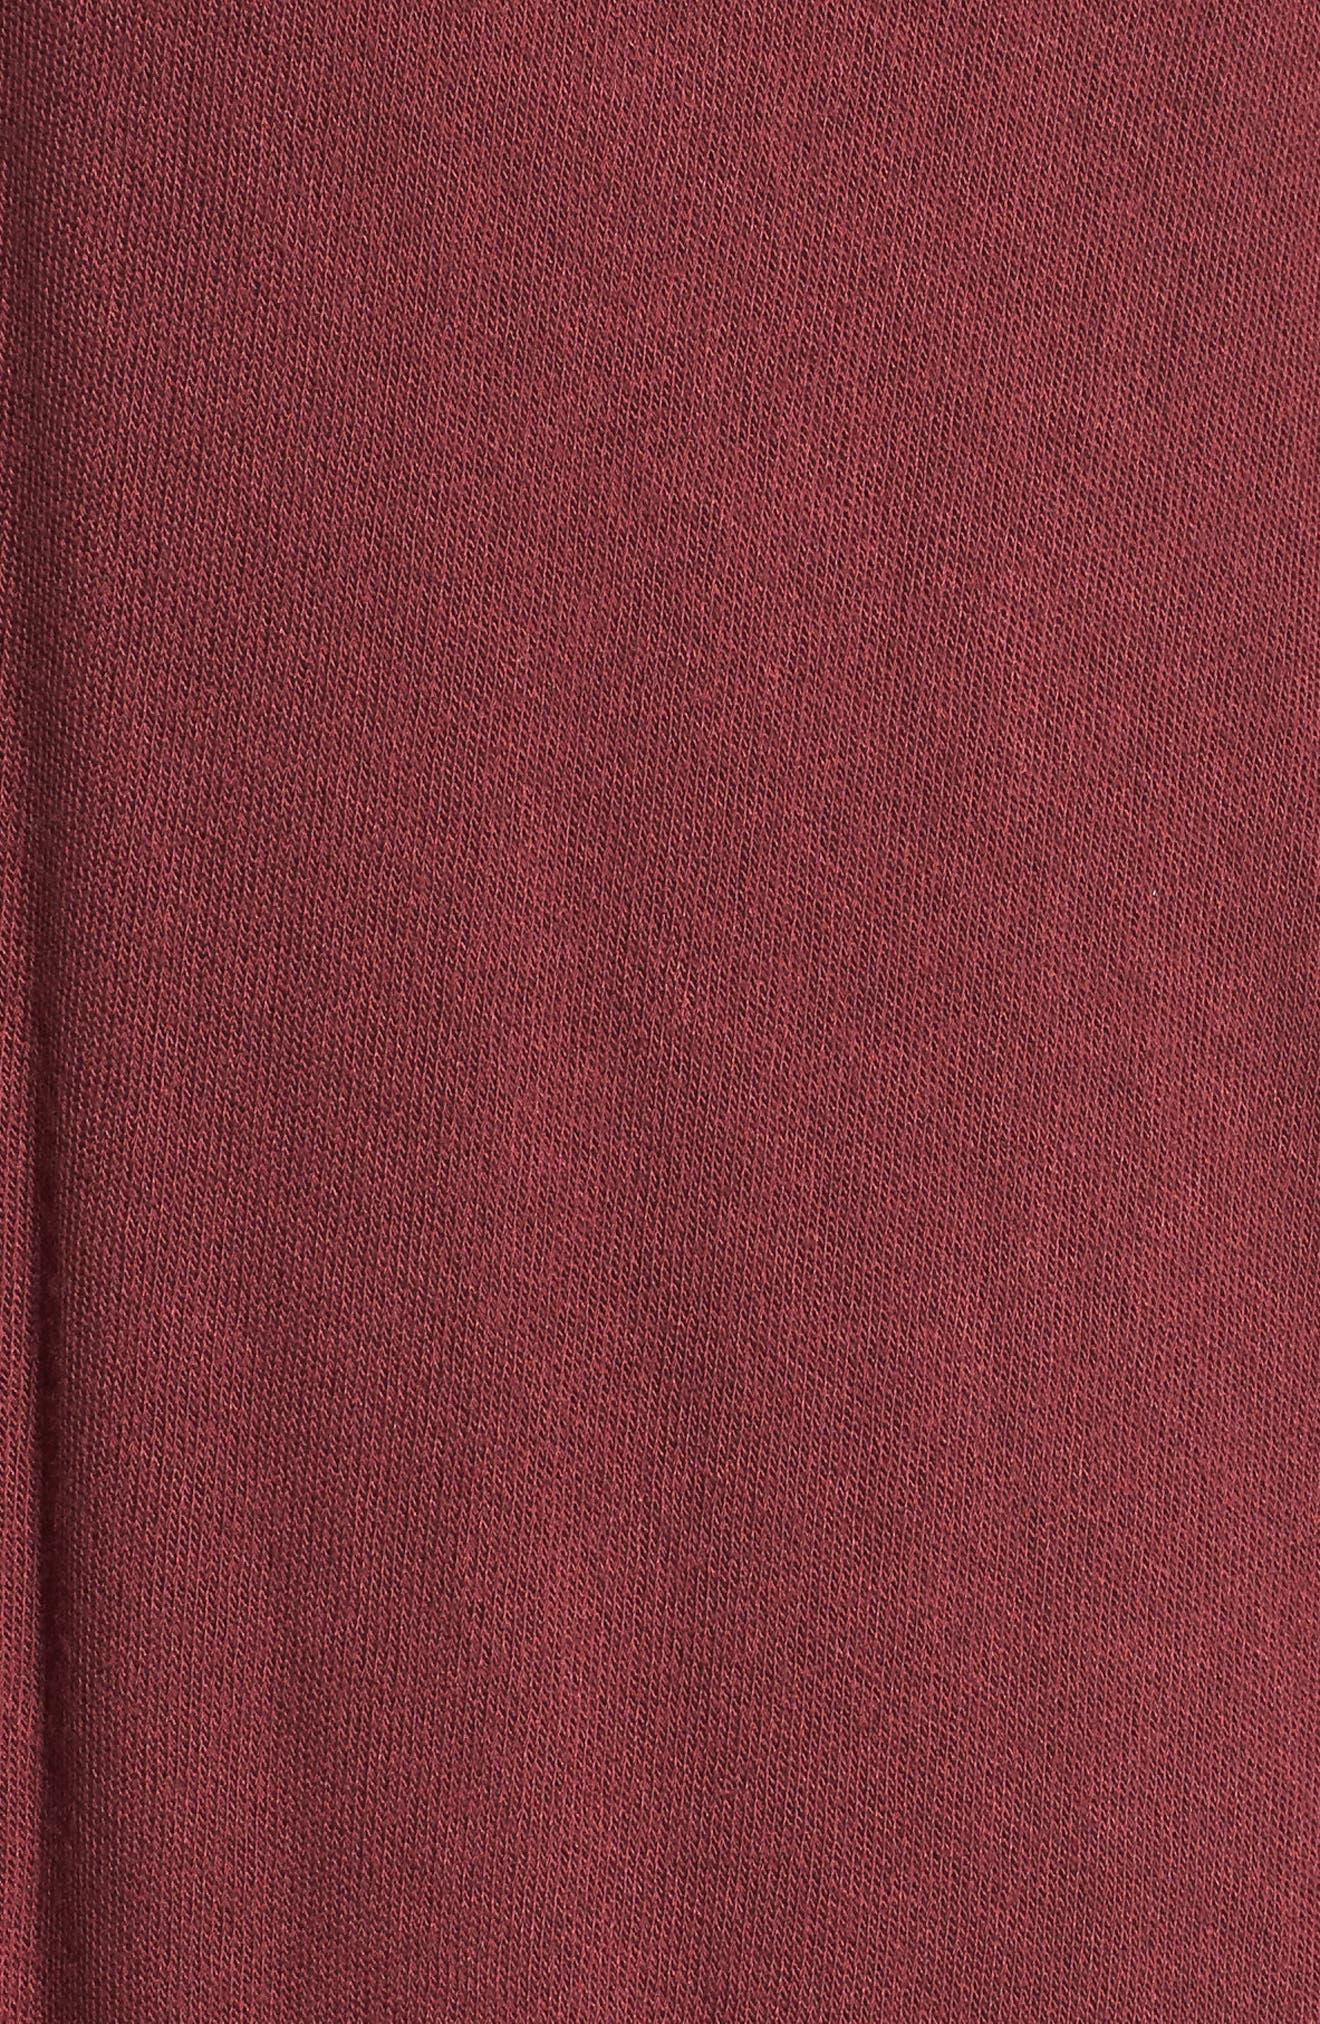 Alternate Image 5  - Sejour Lightweight Cardigan (Plus Size)